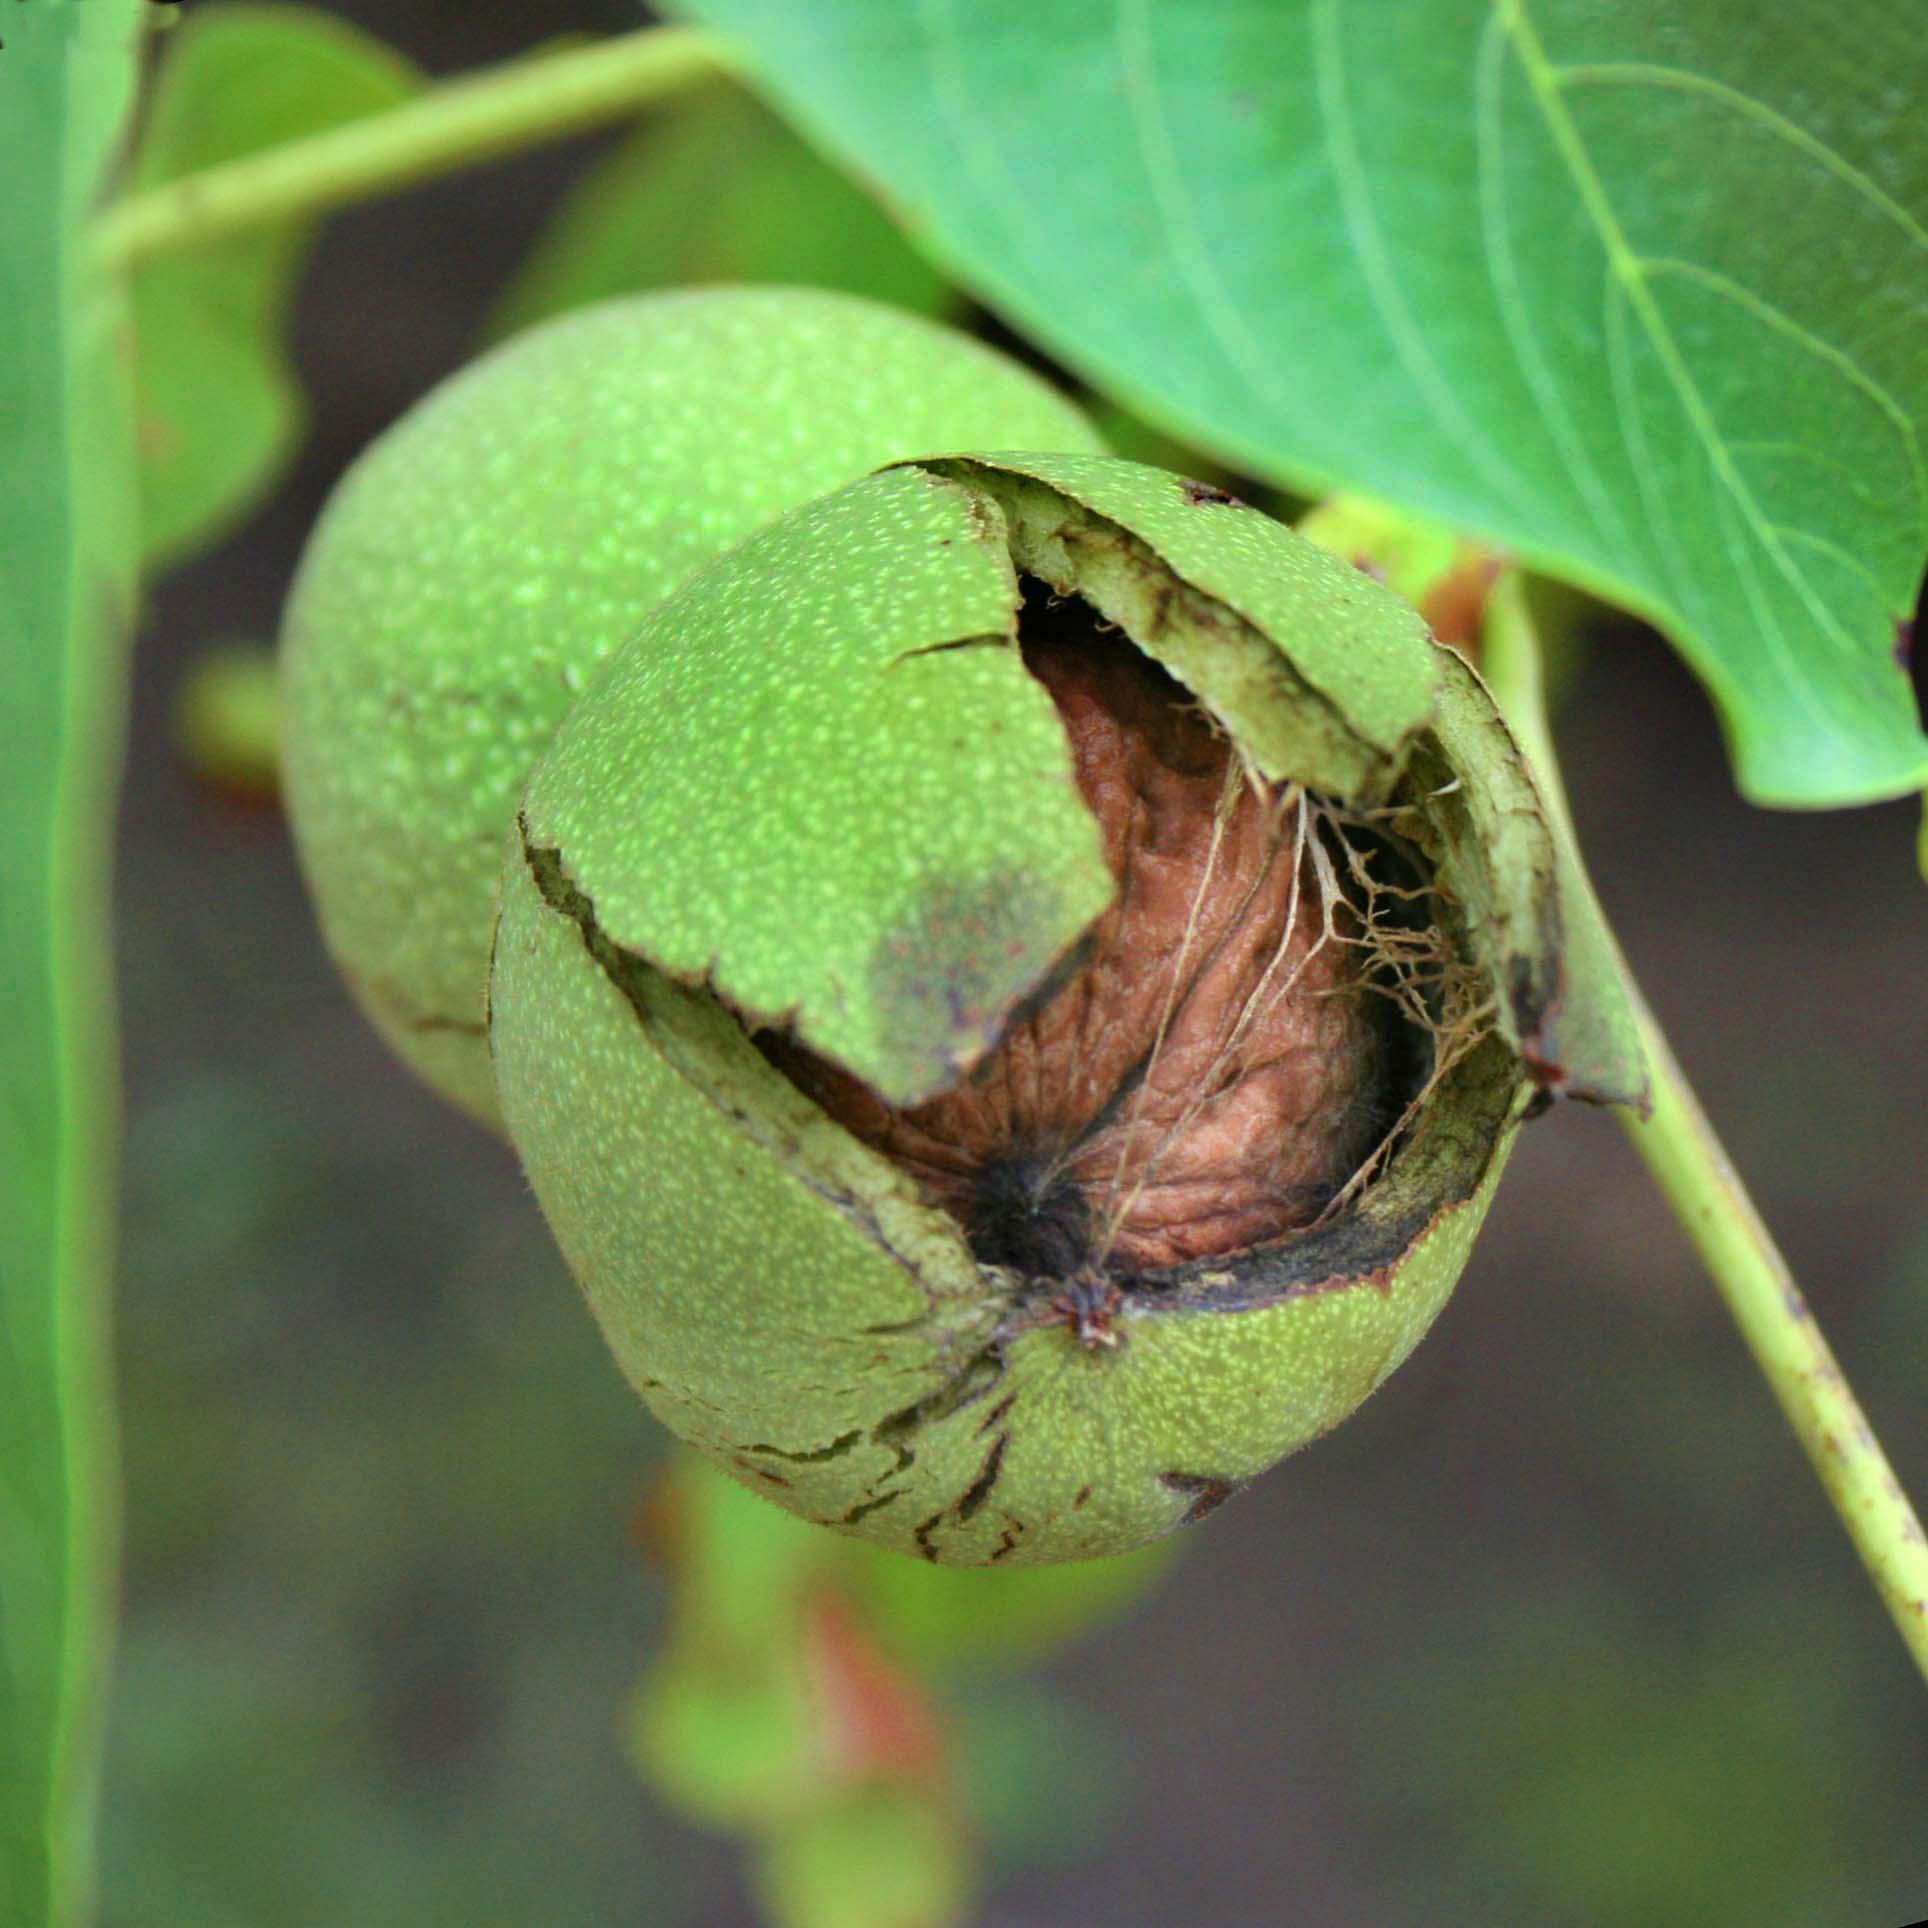 walnutshome